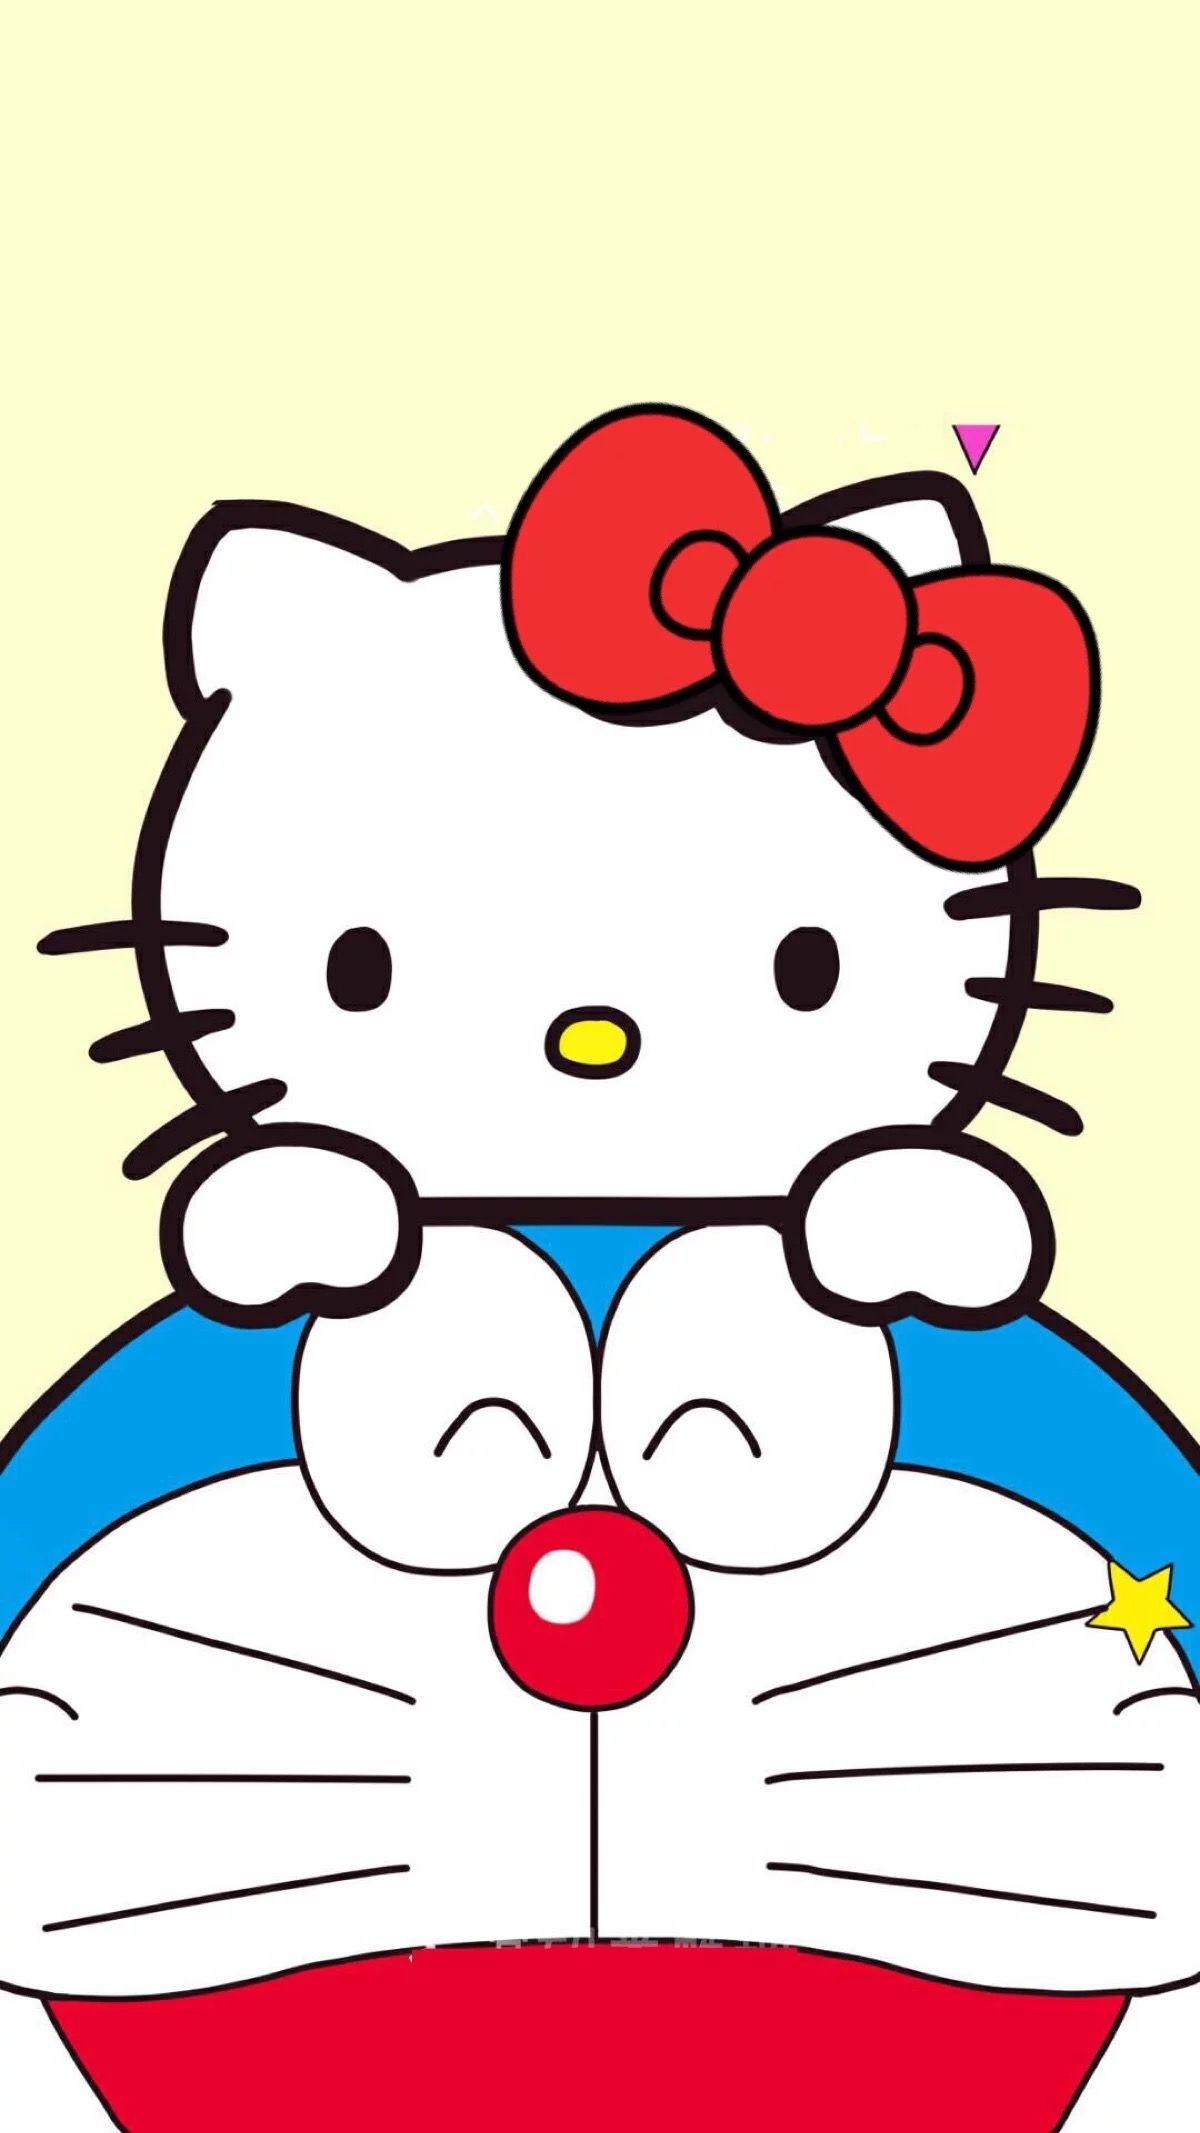 Beautiful Wallpaper Hello Kitty Head - 34996ea1e9c76d77ab910305e69db894  Snapshot_635664.jpg